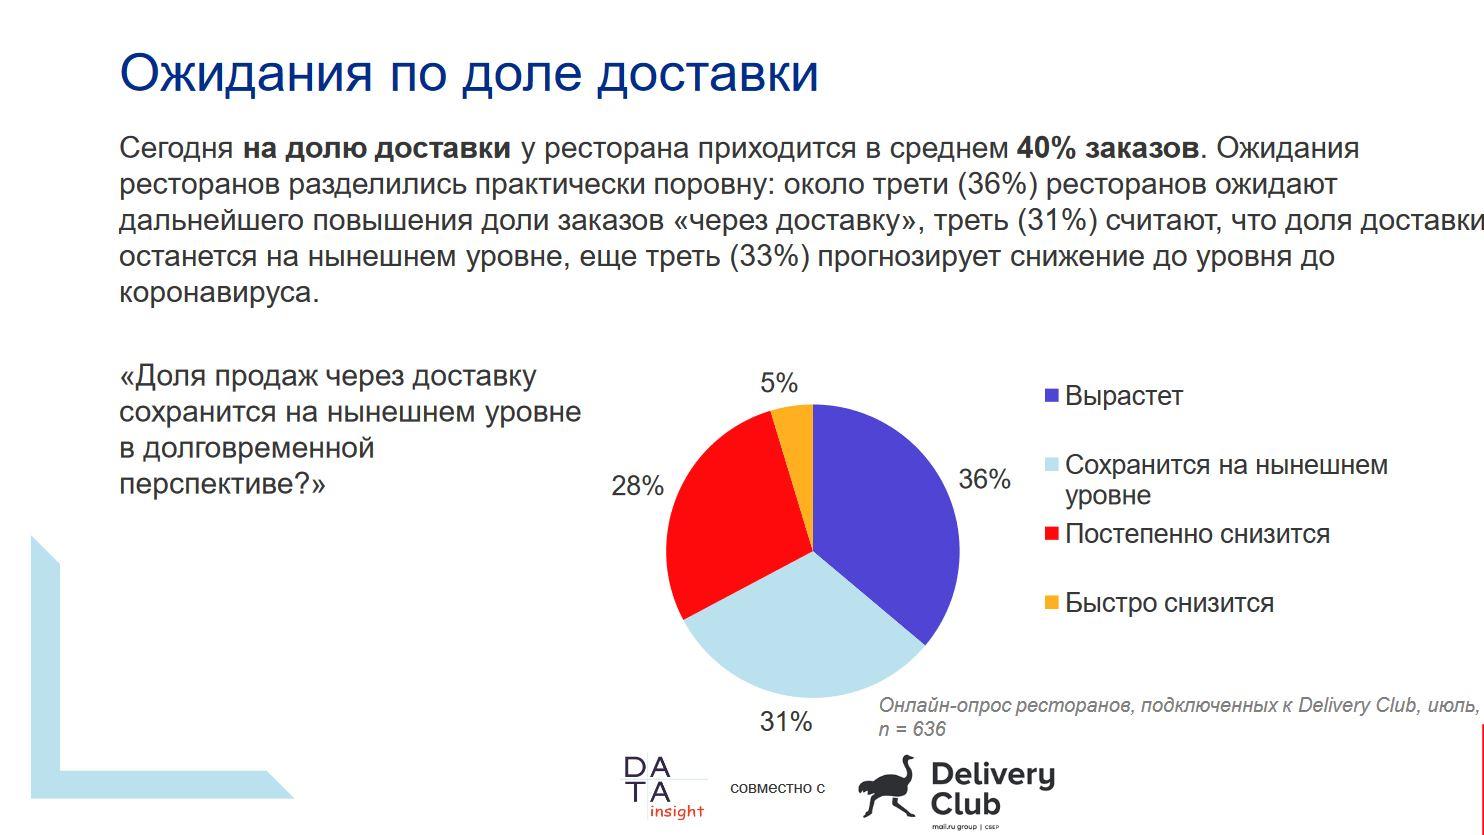 postcovid restaurants russia delivery type 2